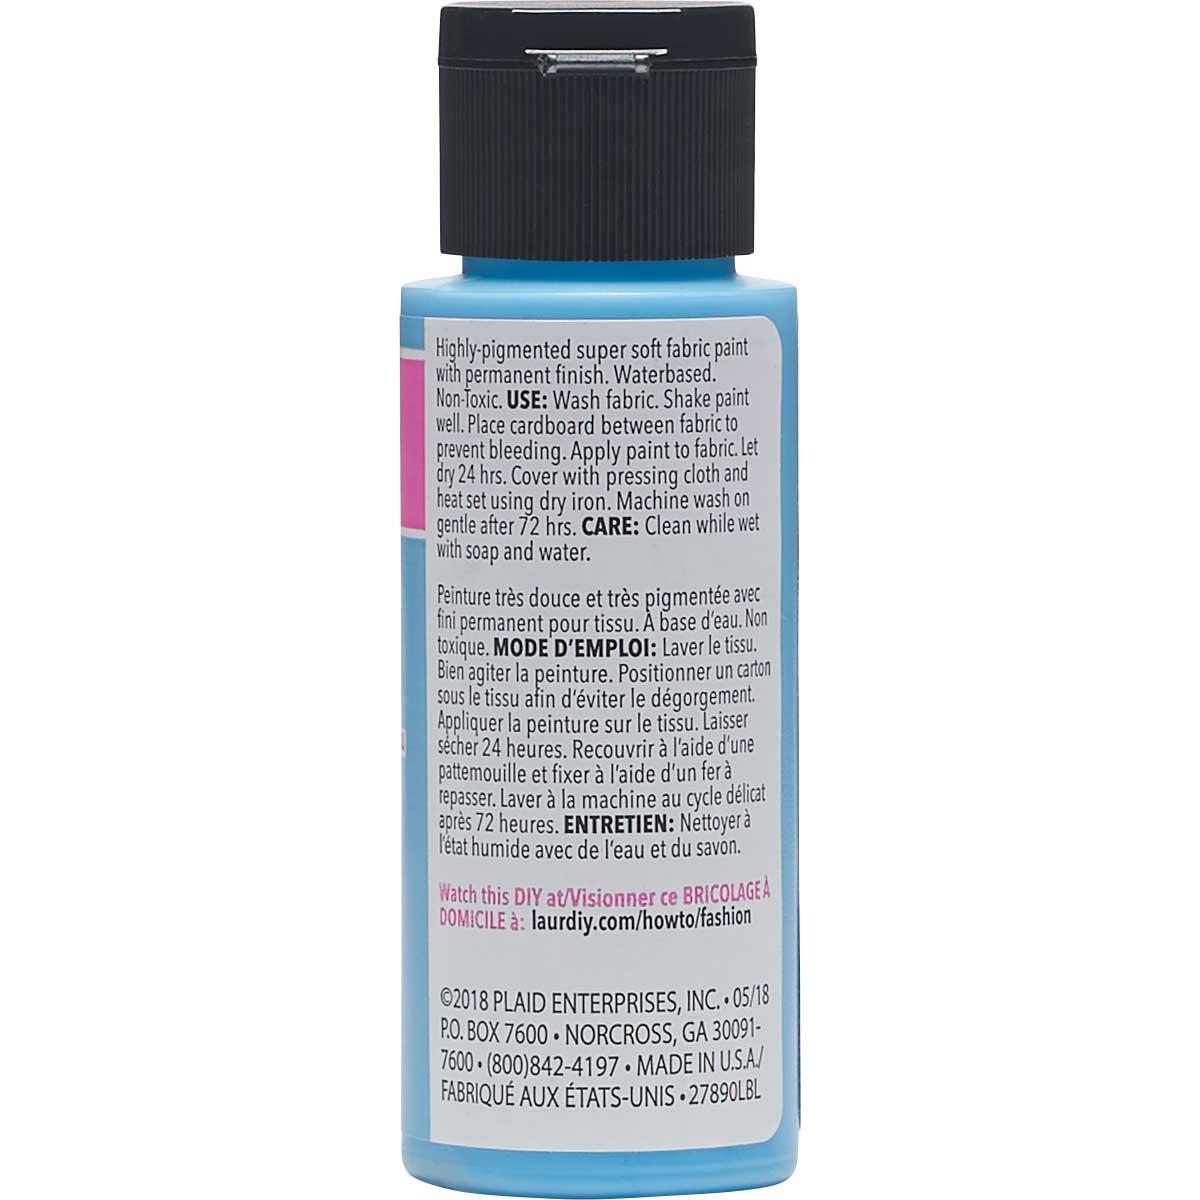 LaurDIY ® Perfect Fabric Paint - What It Dew, 2 oz. - 27890